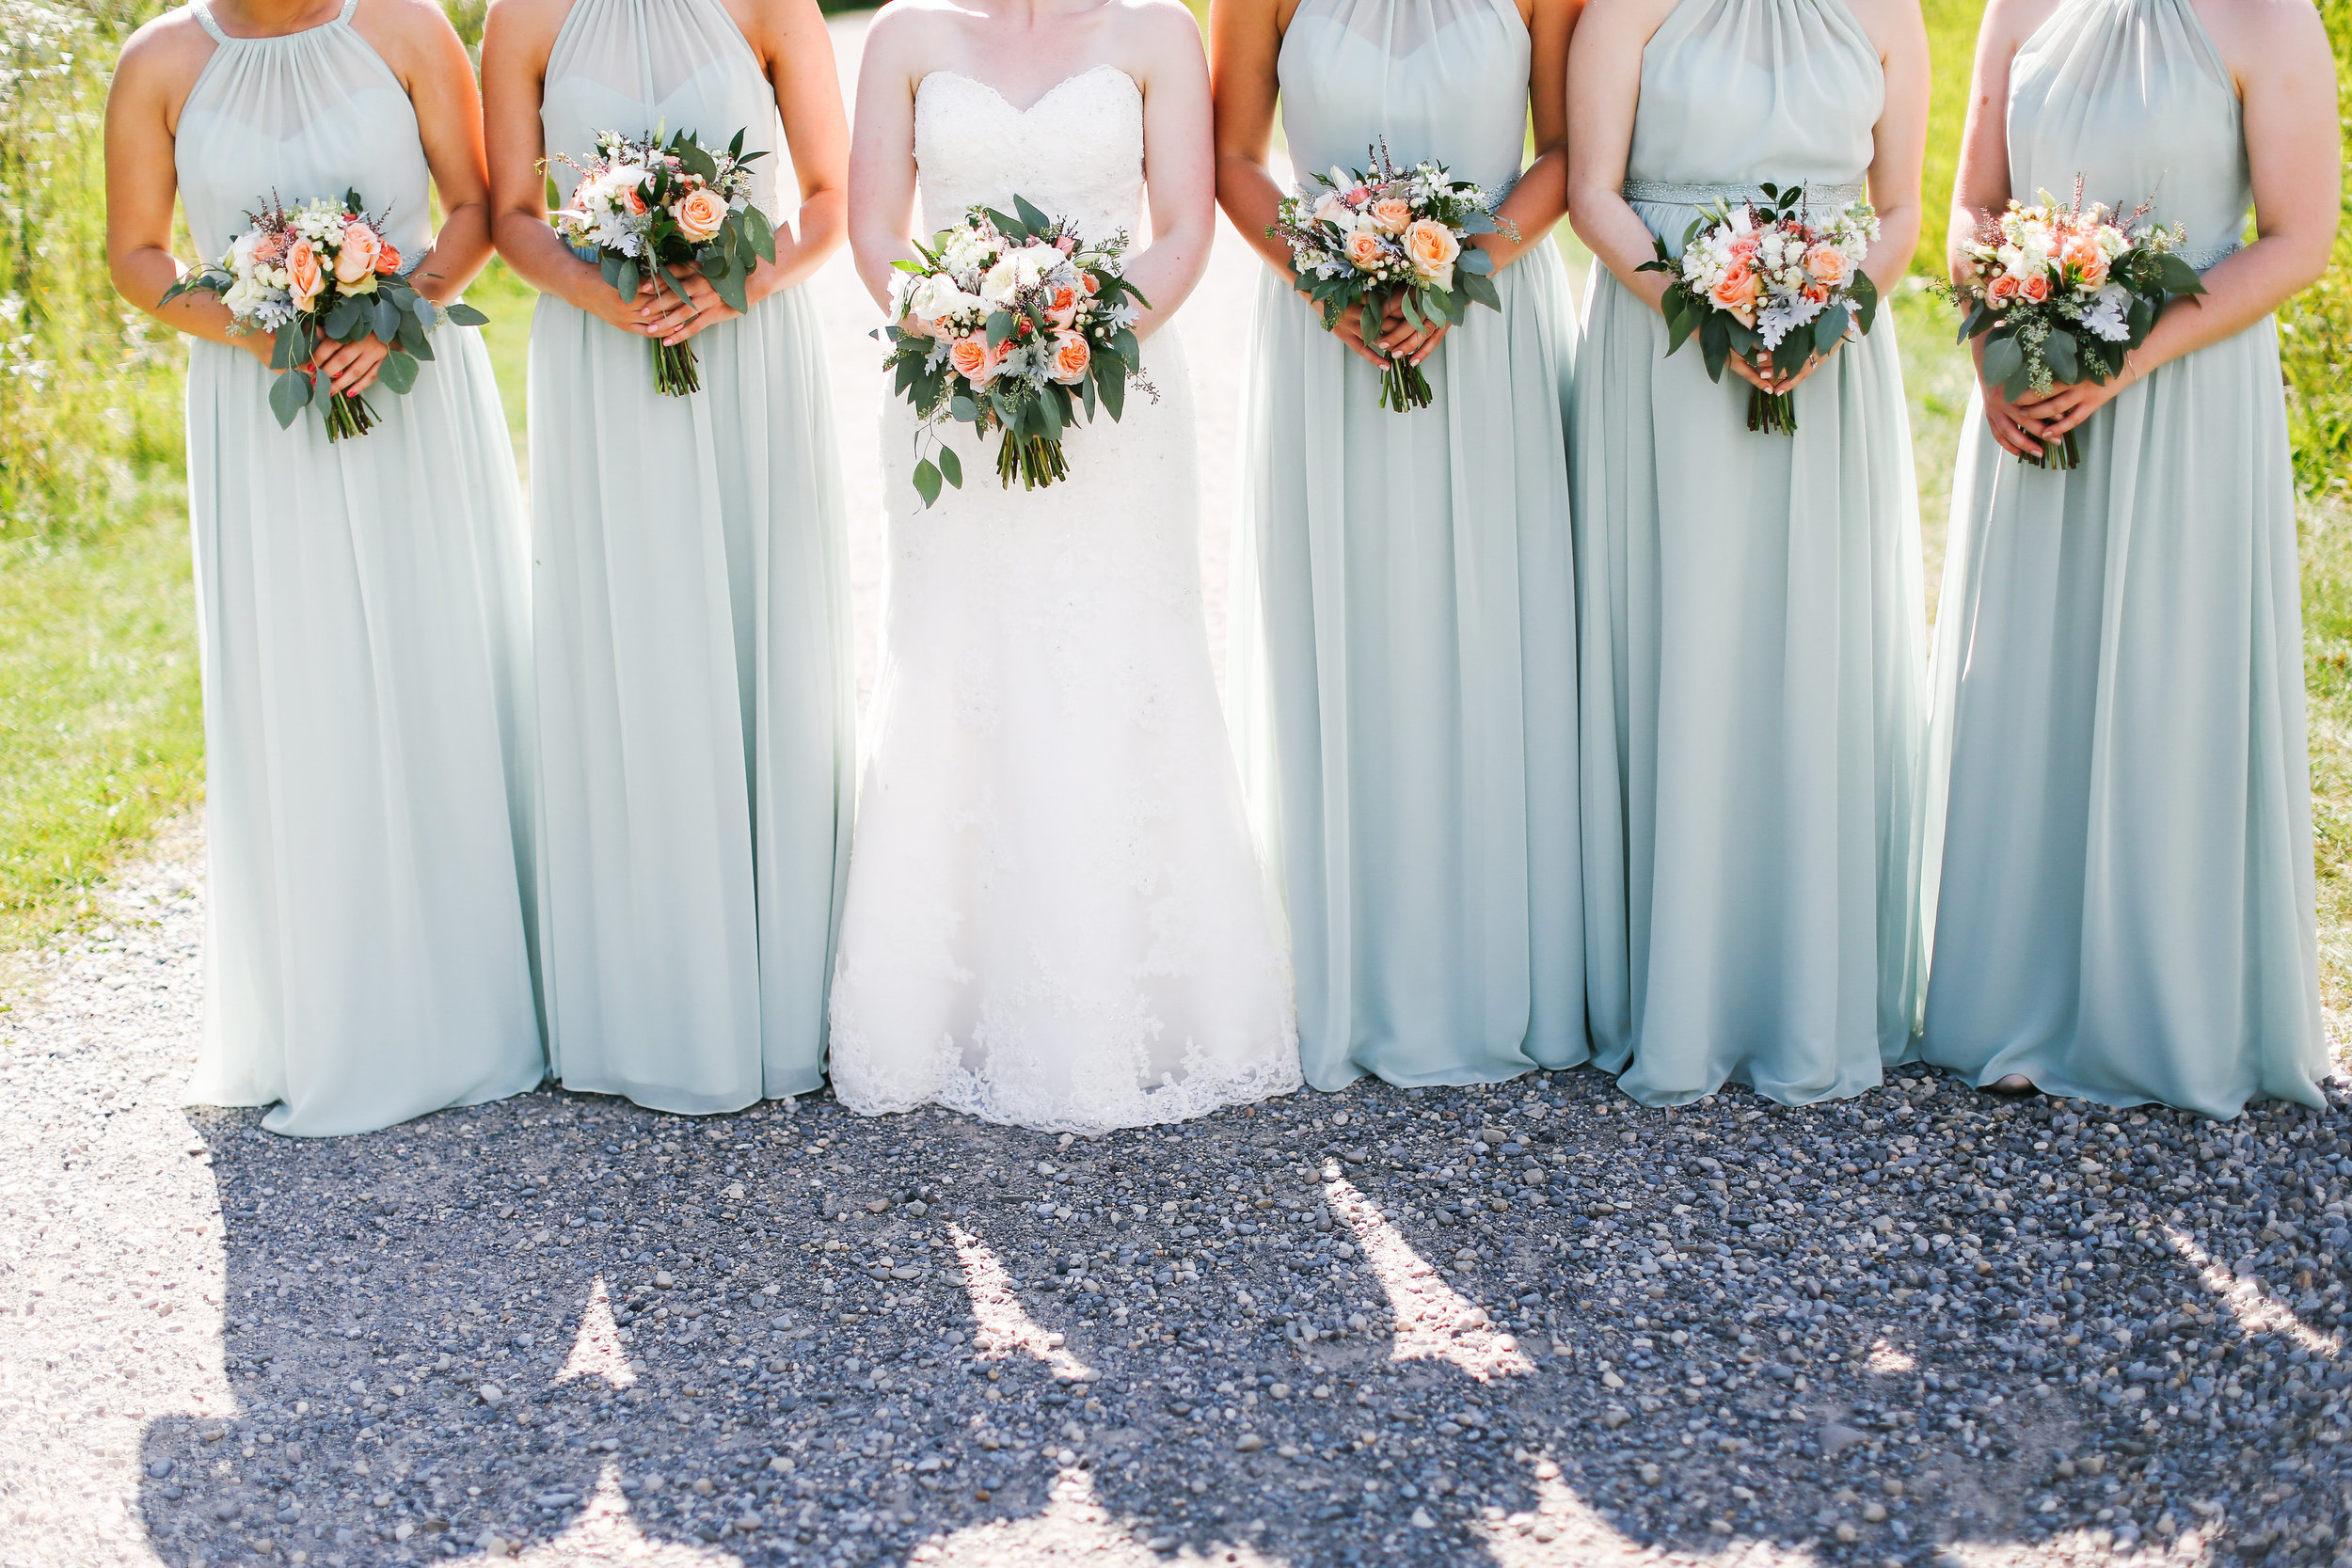 wedding bouquet bridal party